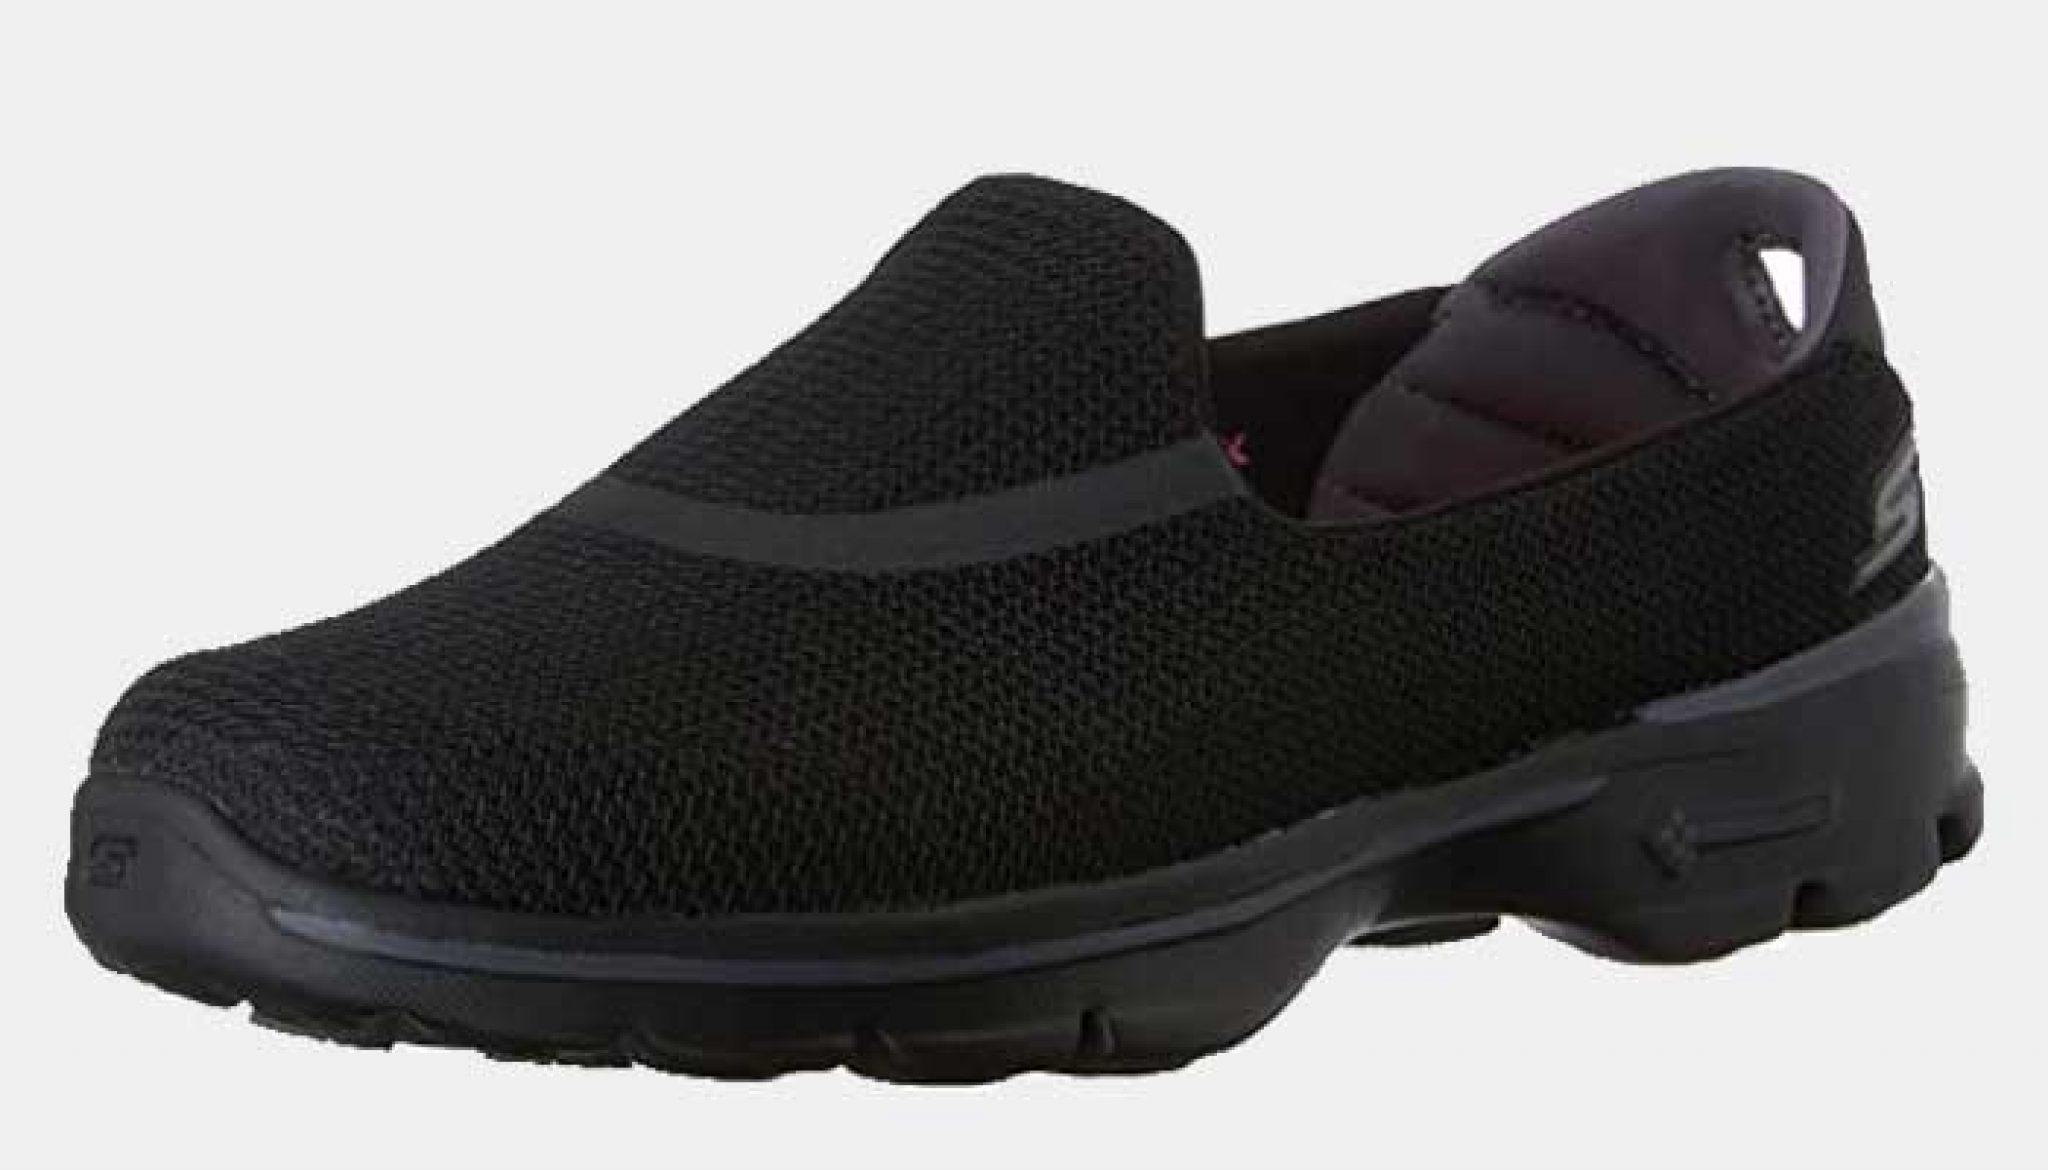 best price skechers shoes